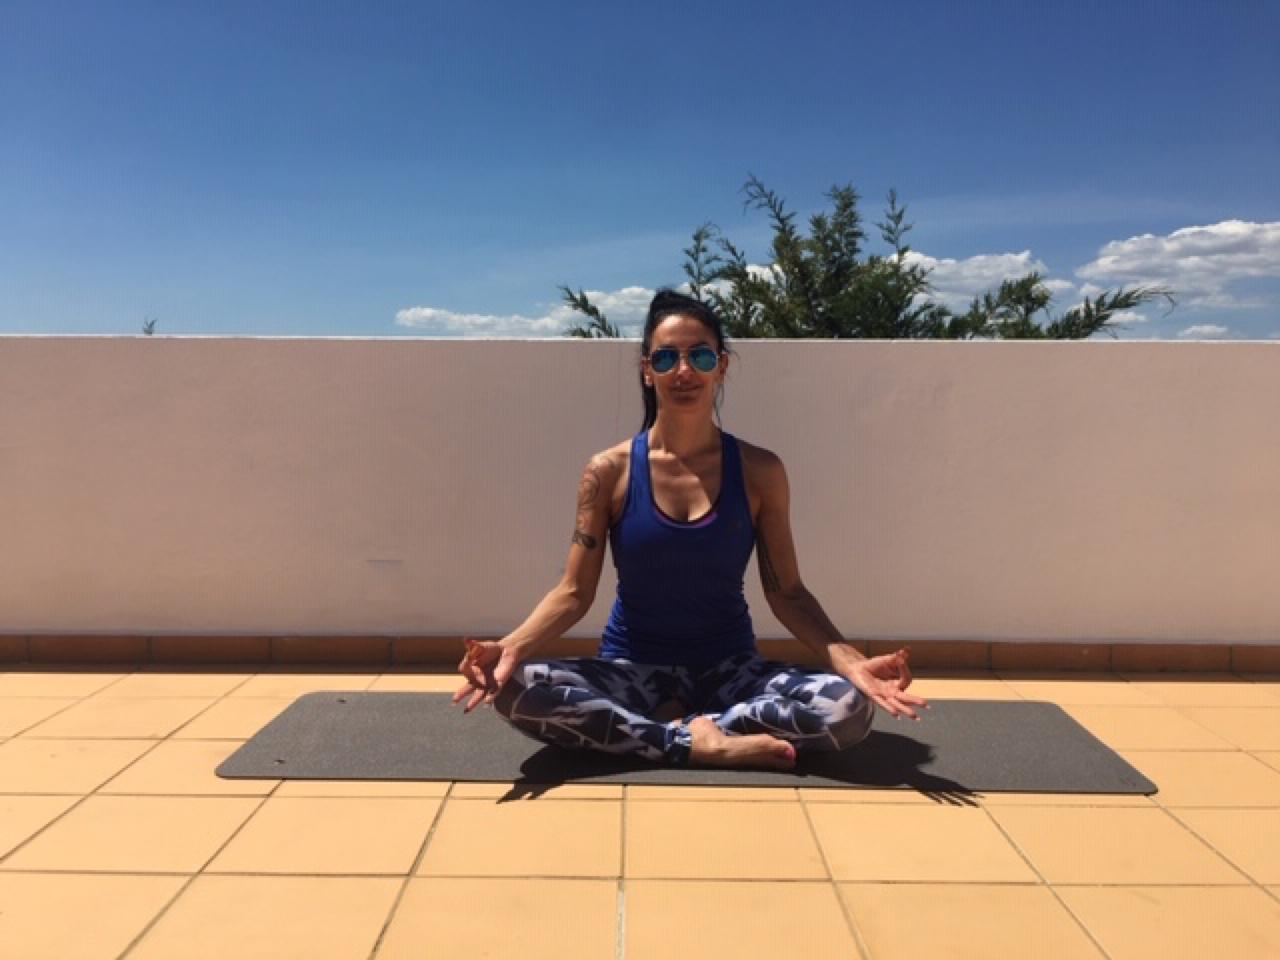 Cristina doing yoga